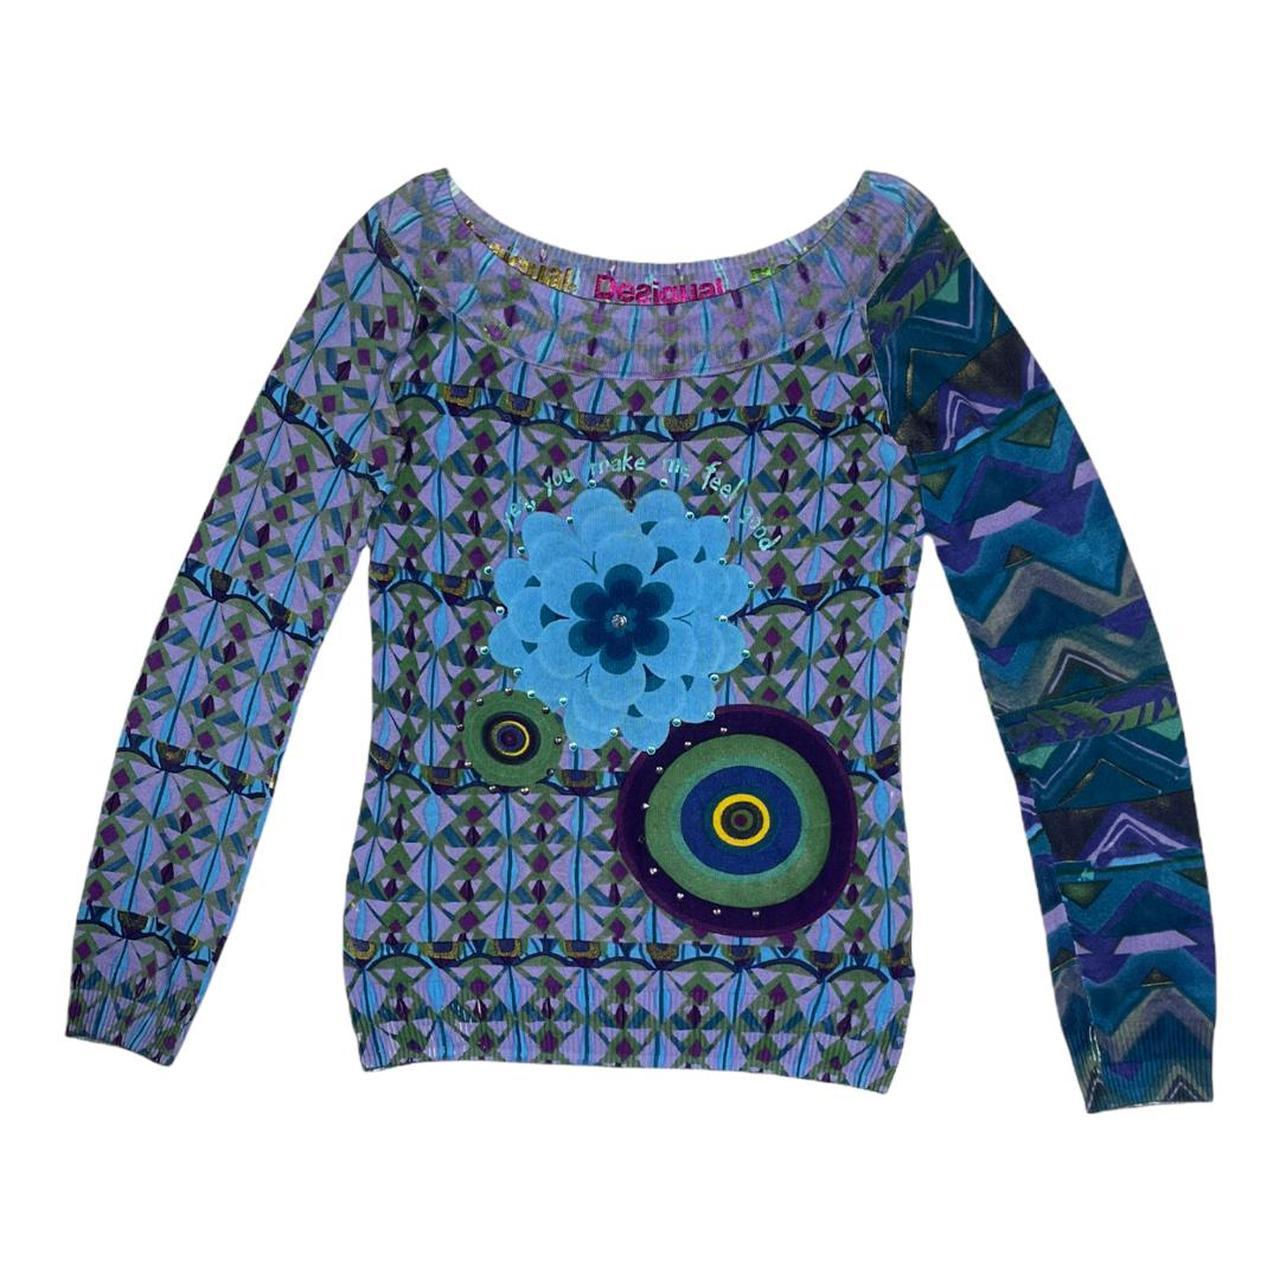 Product Image 1 - Unique graphic print sweater. Big